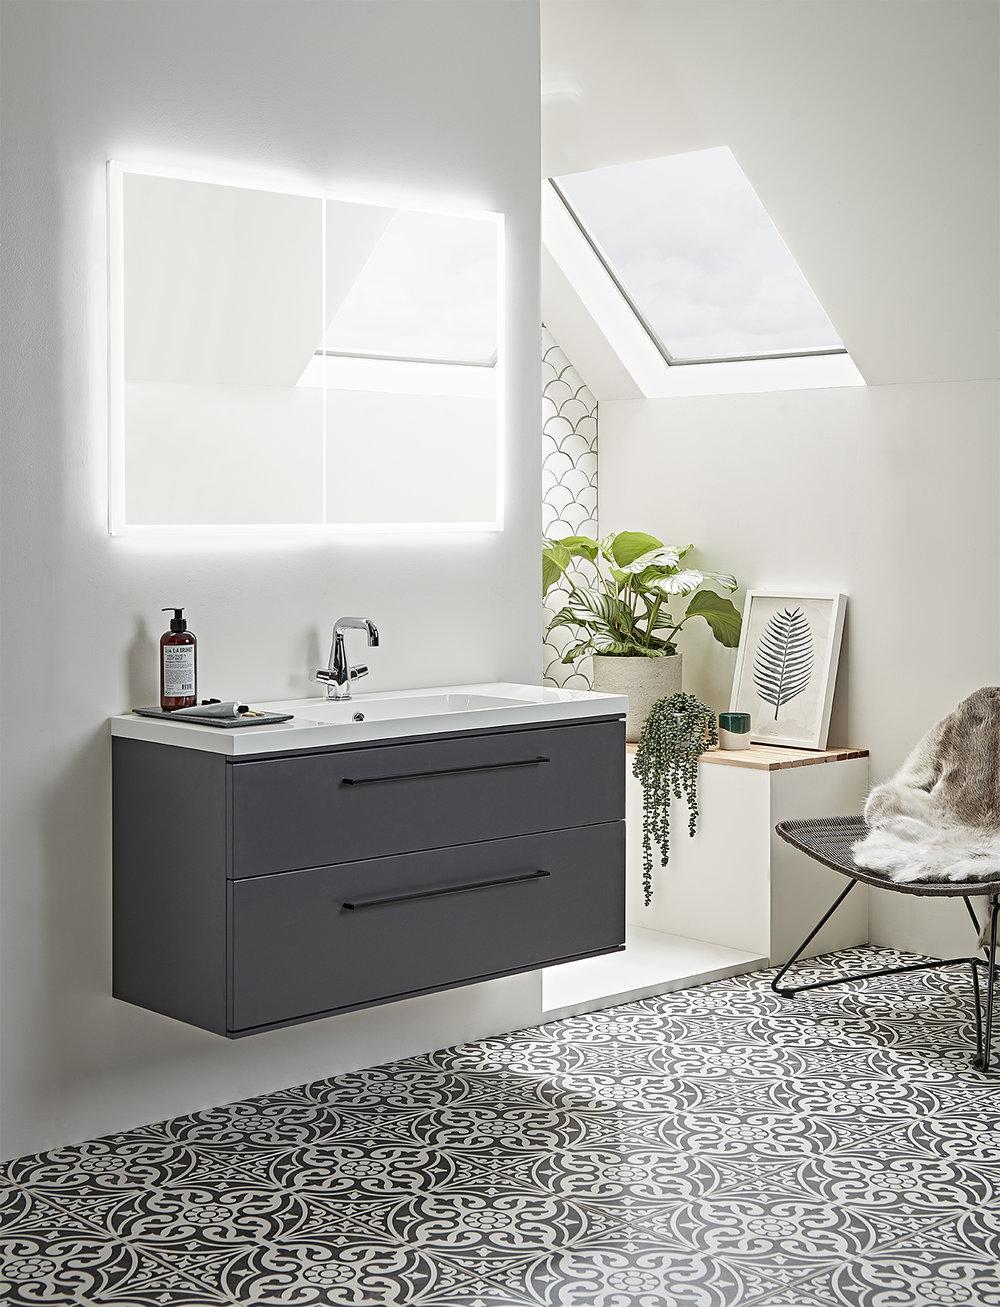 Scheme 1000mm Matte Carbon Vanity  with  Purpose Recessed Cabinet